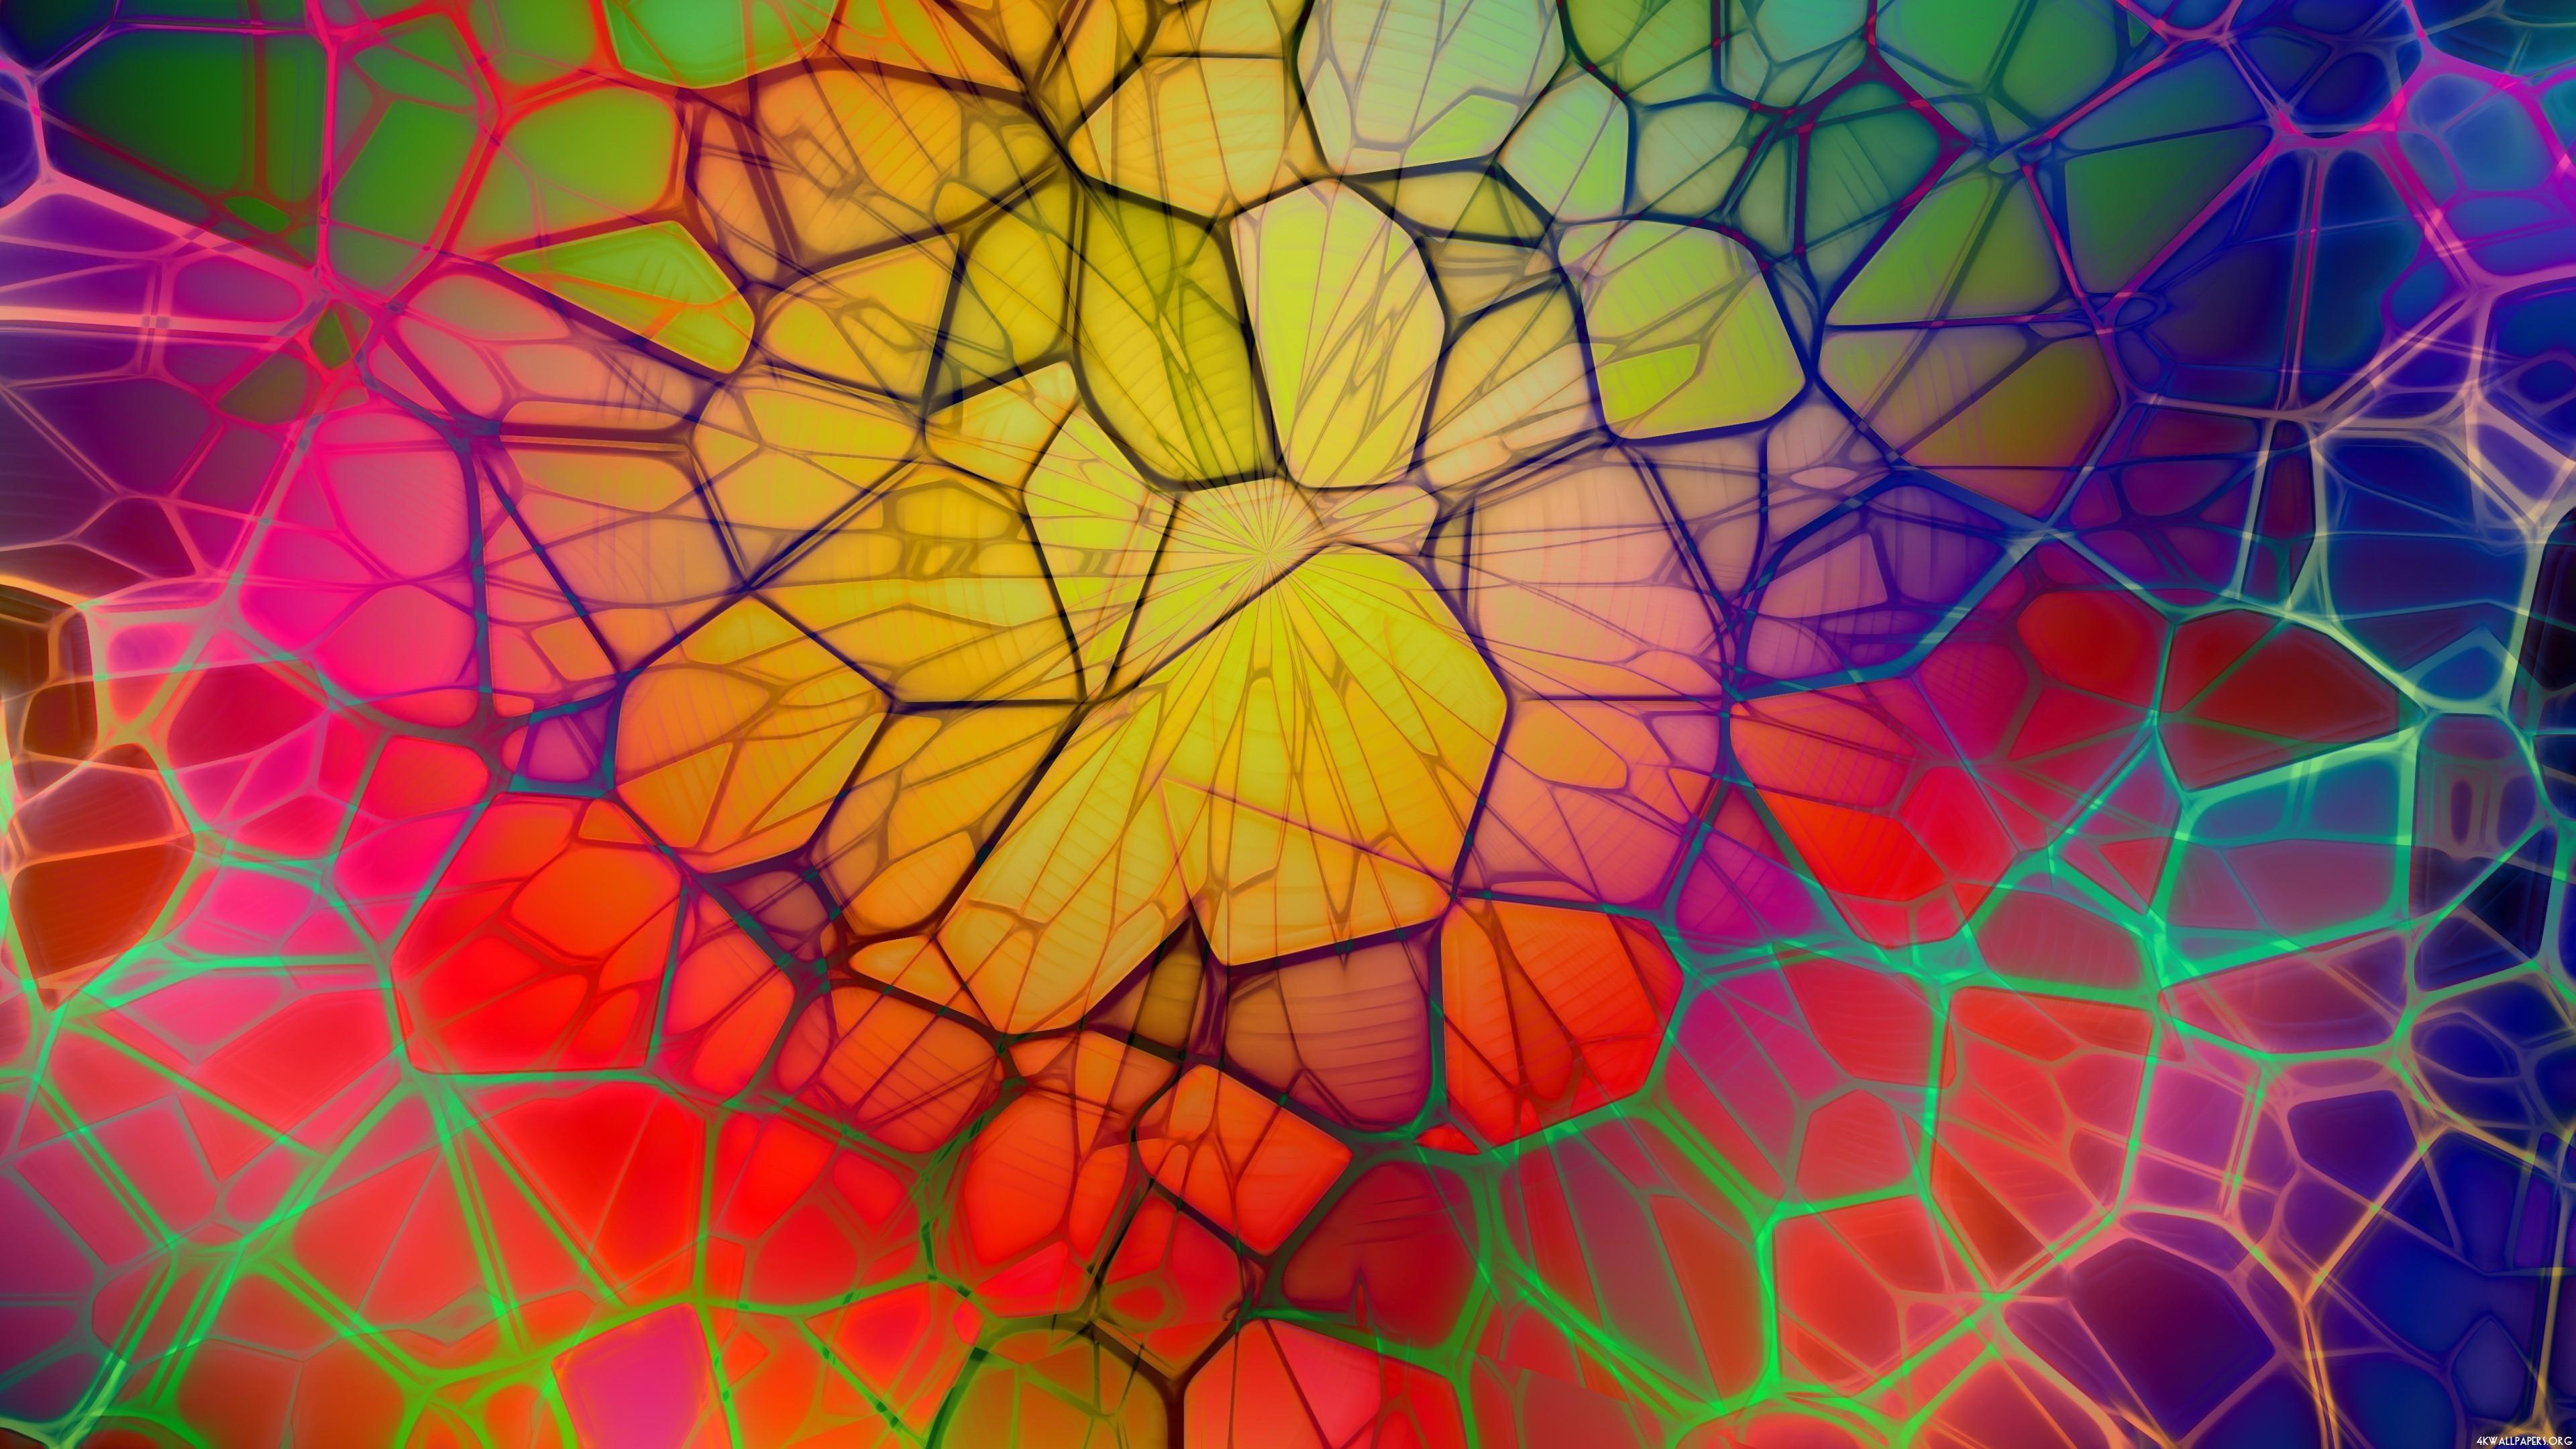 Abstract Painting 4k Hd Desktop Wallpaper For 4k Ultra Hd: Wallpaper : Colorful, Digital Art, Window, Abstract, 3D